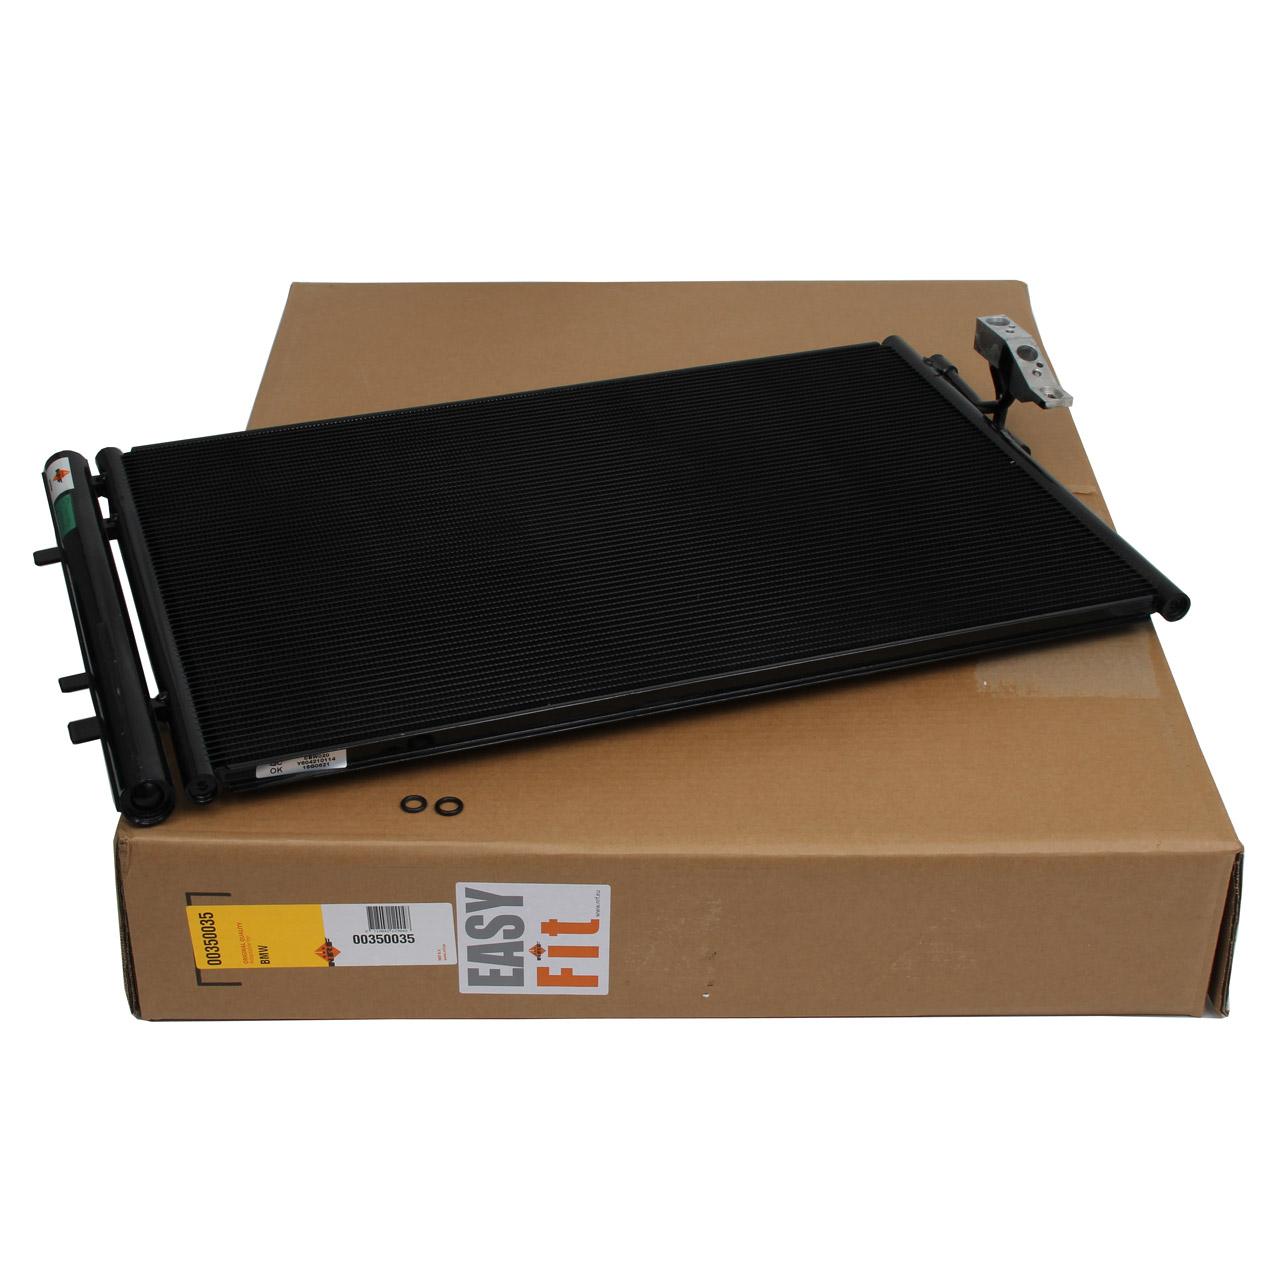 NRF 350035 Kondensator Klima EASY FIT BMW X3 F25 xDrive 28i 258 PS N52 64539216144